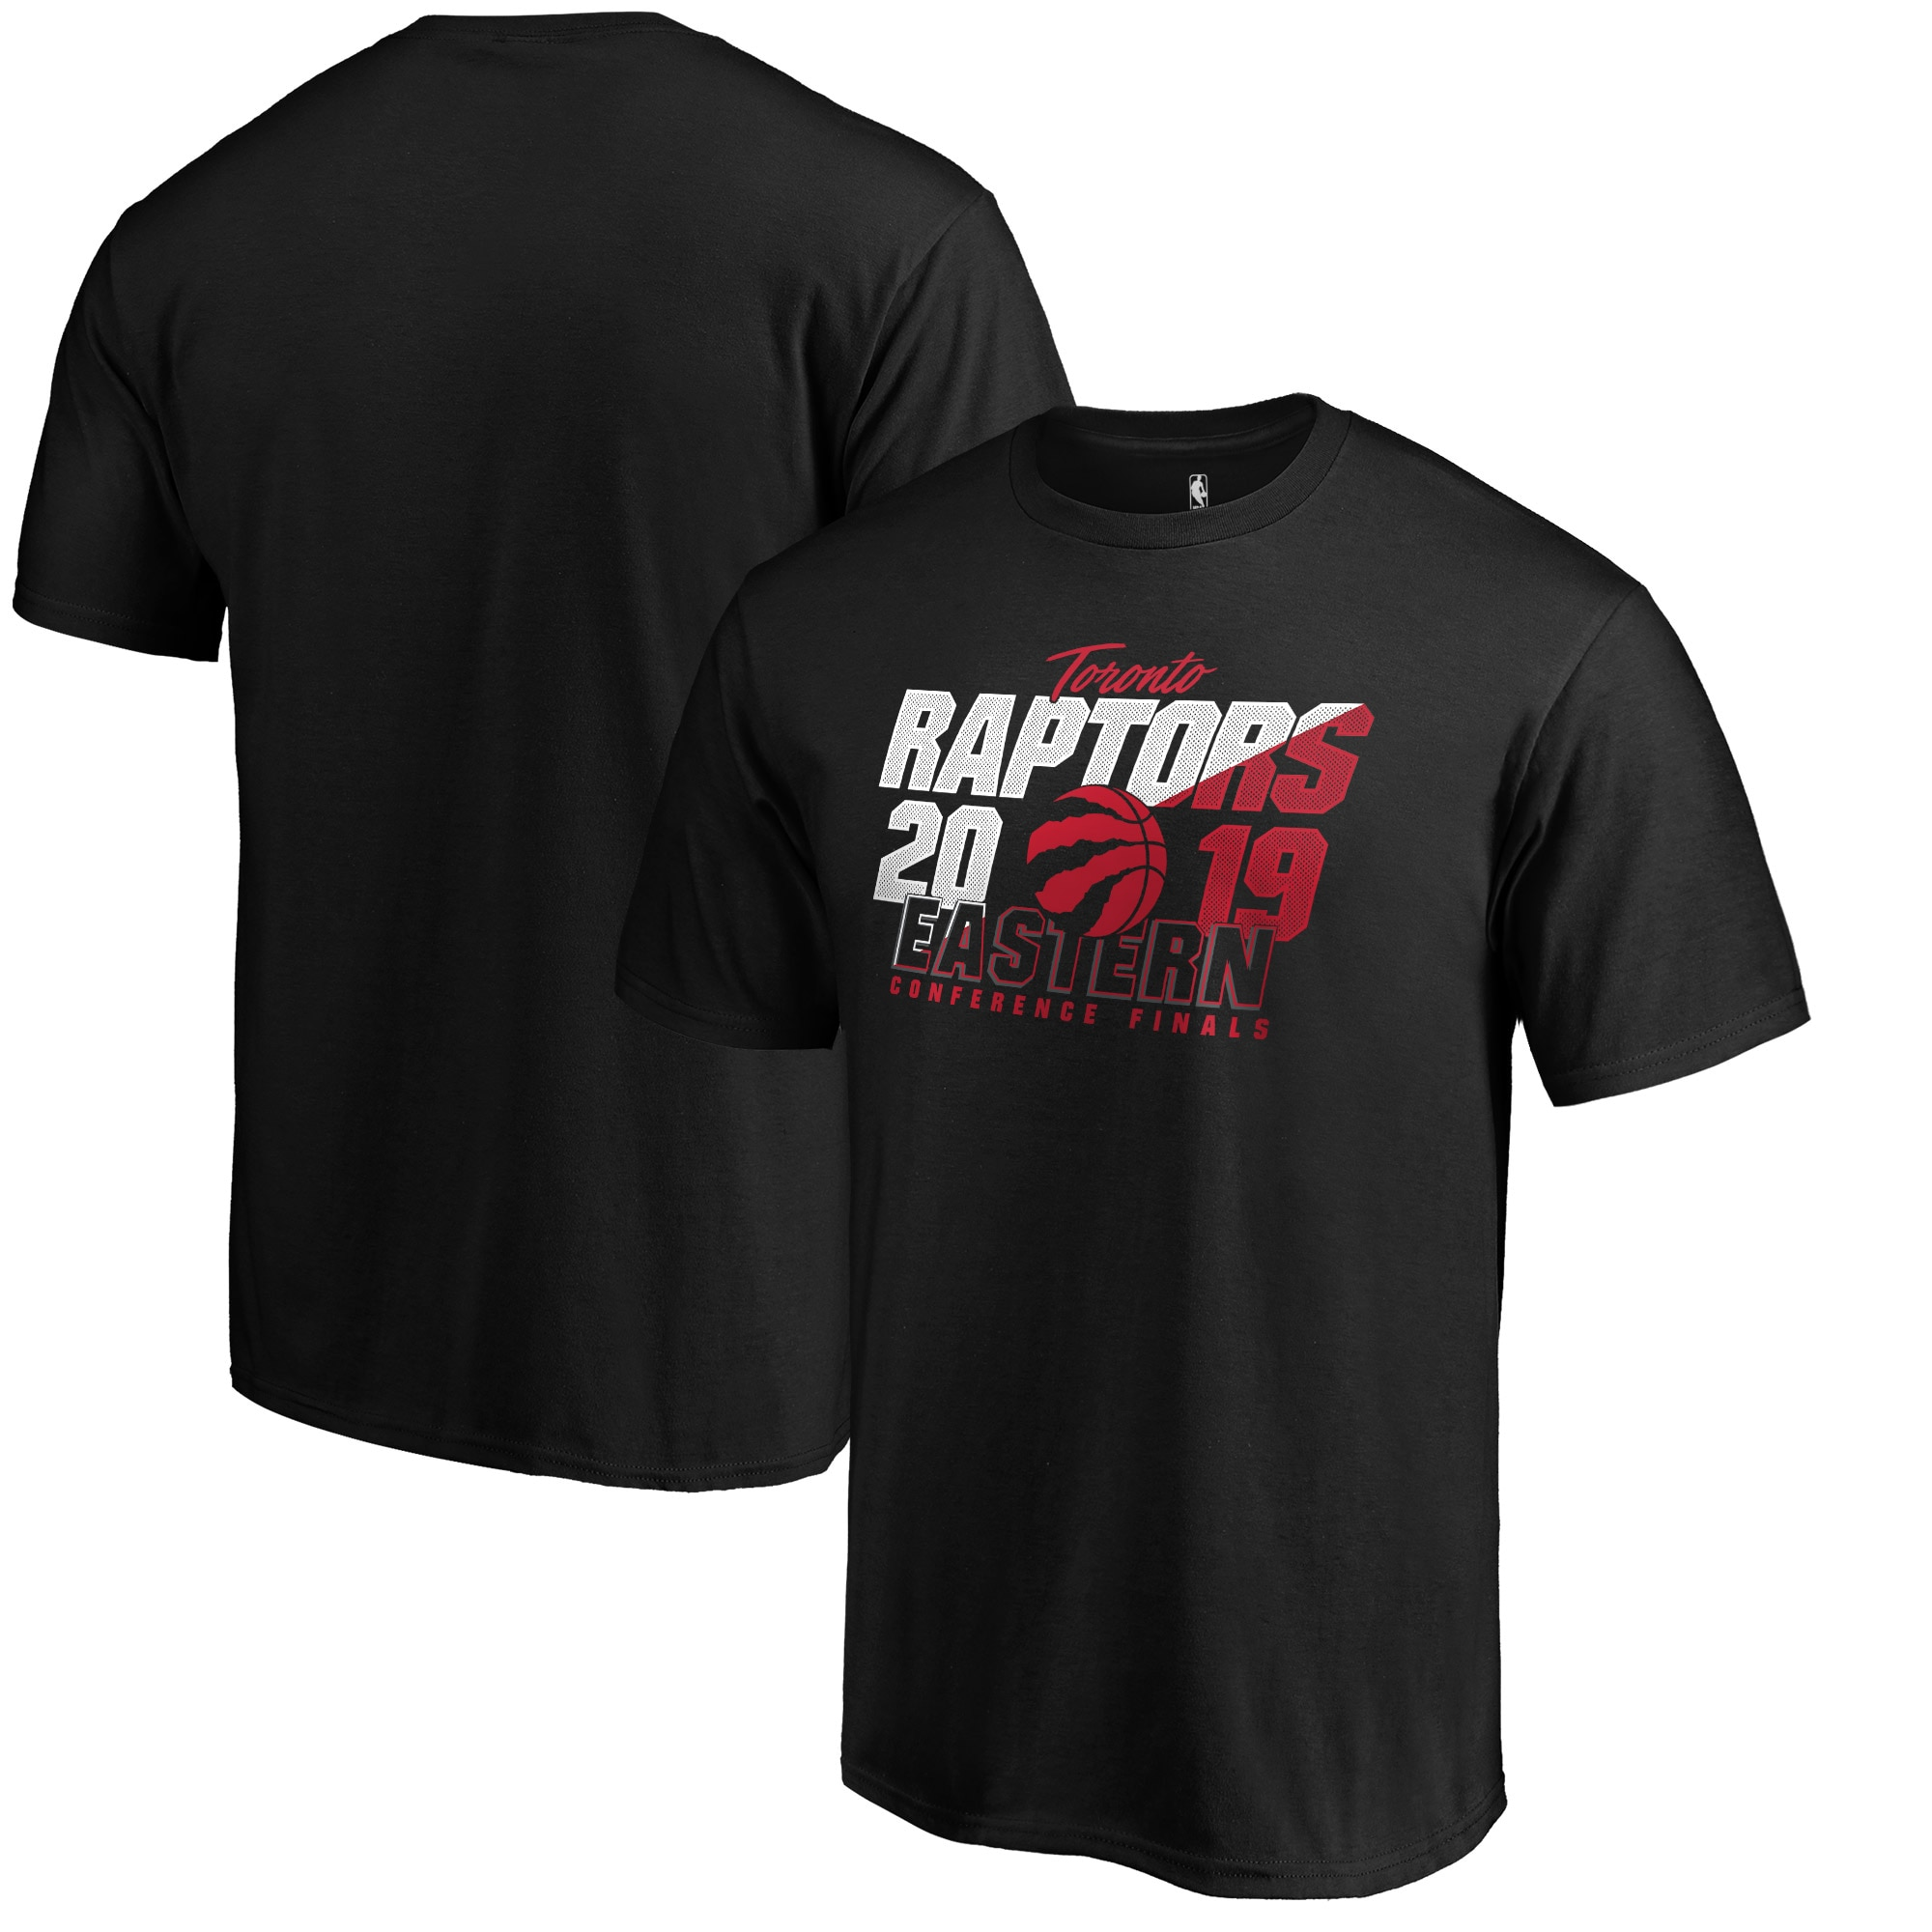 Toronto Raptors Fanatics Branded 2019 NBA Playoffs Eastern Conference Finals Bound Real Flava T-Shirt - Black